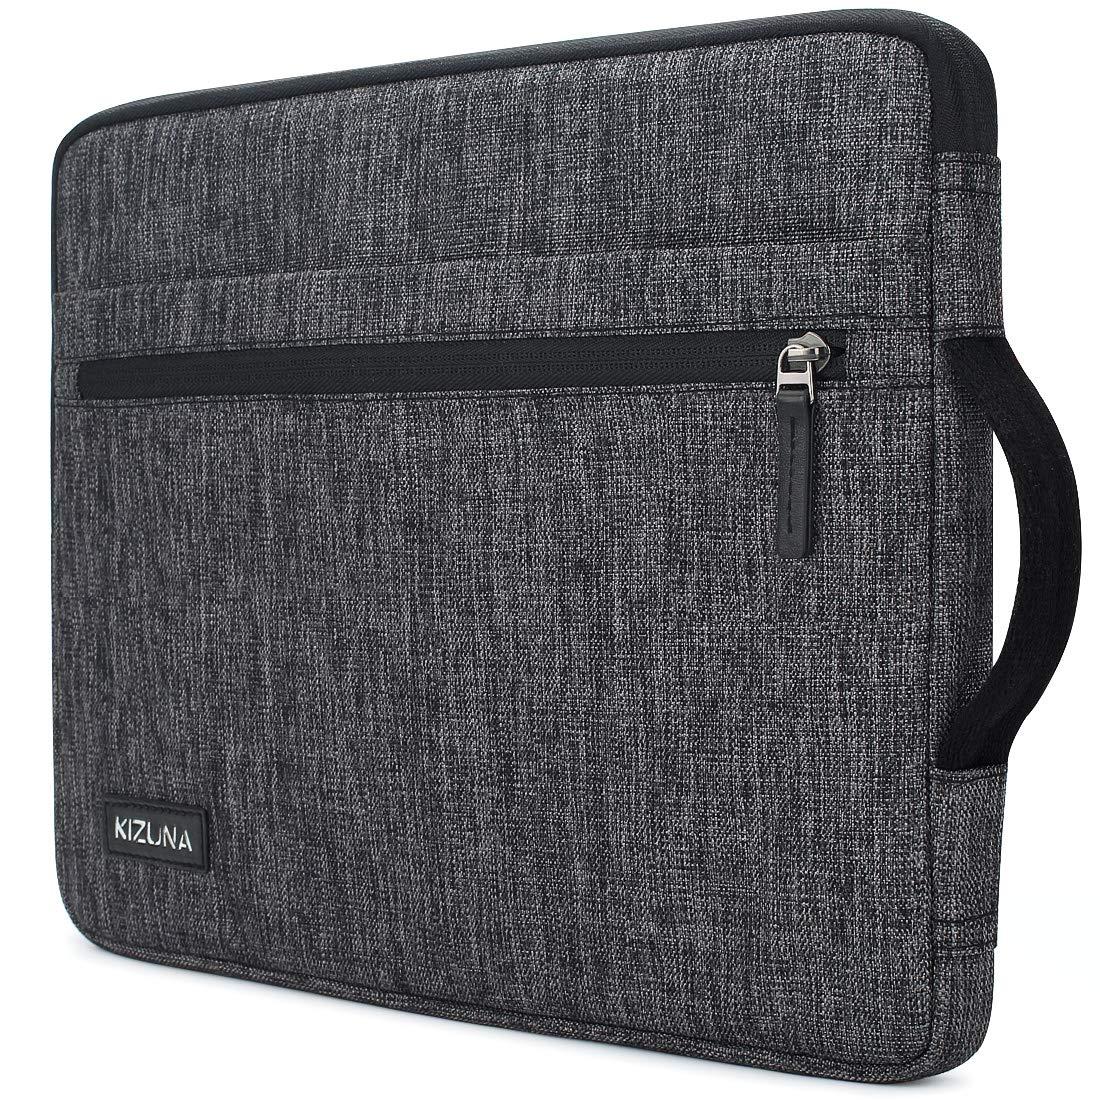 KIZUNA 14 Inch Laptop Sleeve Case Bag Notebook Carrying Handbag for Surface Book/Lenovo Flex 4/14'' ThinkPad L480/ThinkPad X1 Carbon 2017/14'' EliteBook 840 G5/14.1'' Dell New Latitude 7490 2018 - Grey